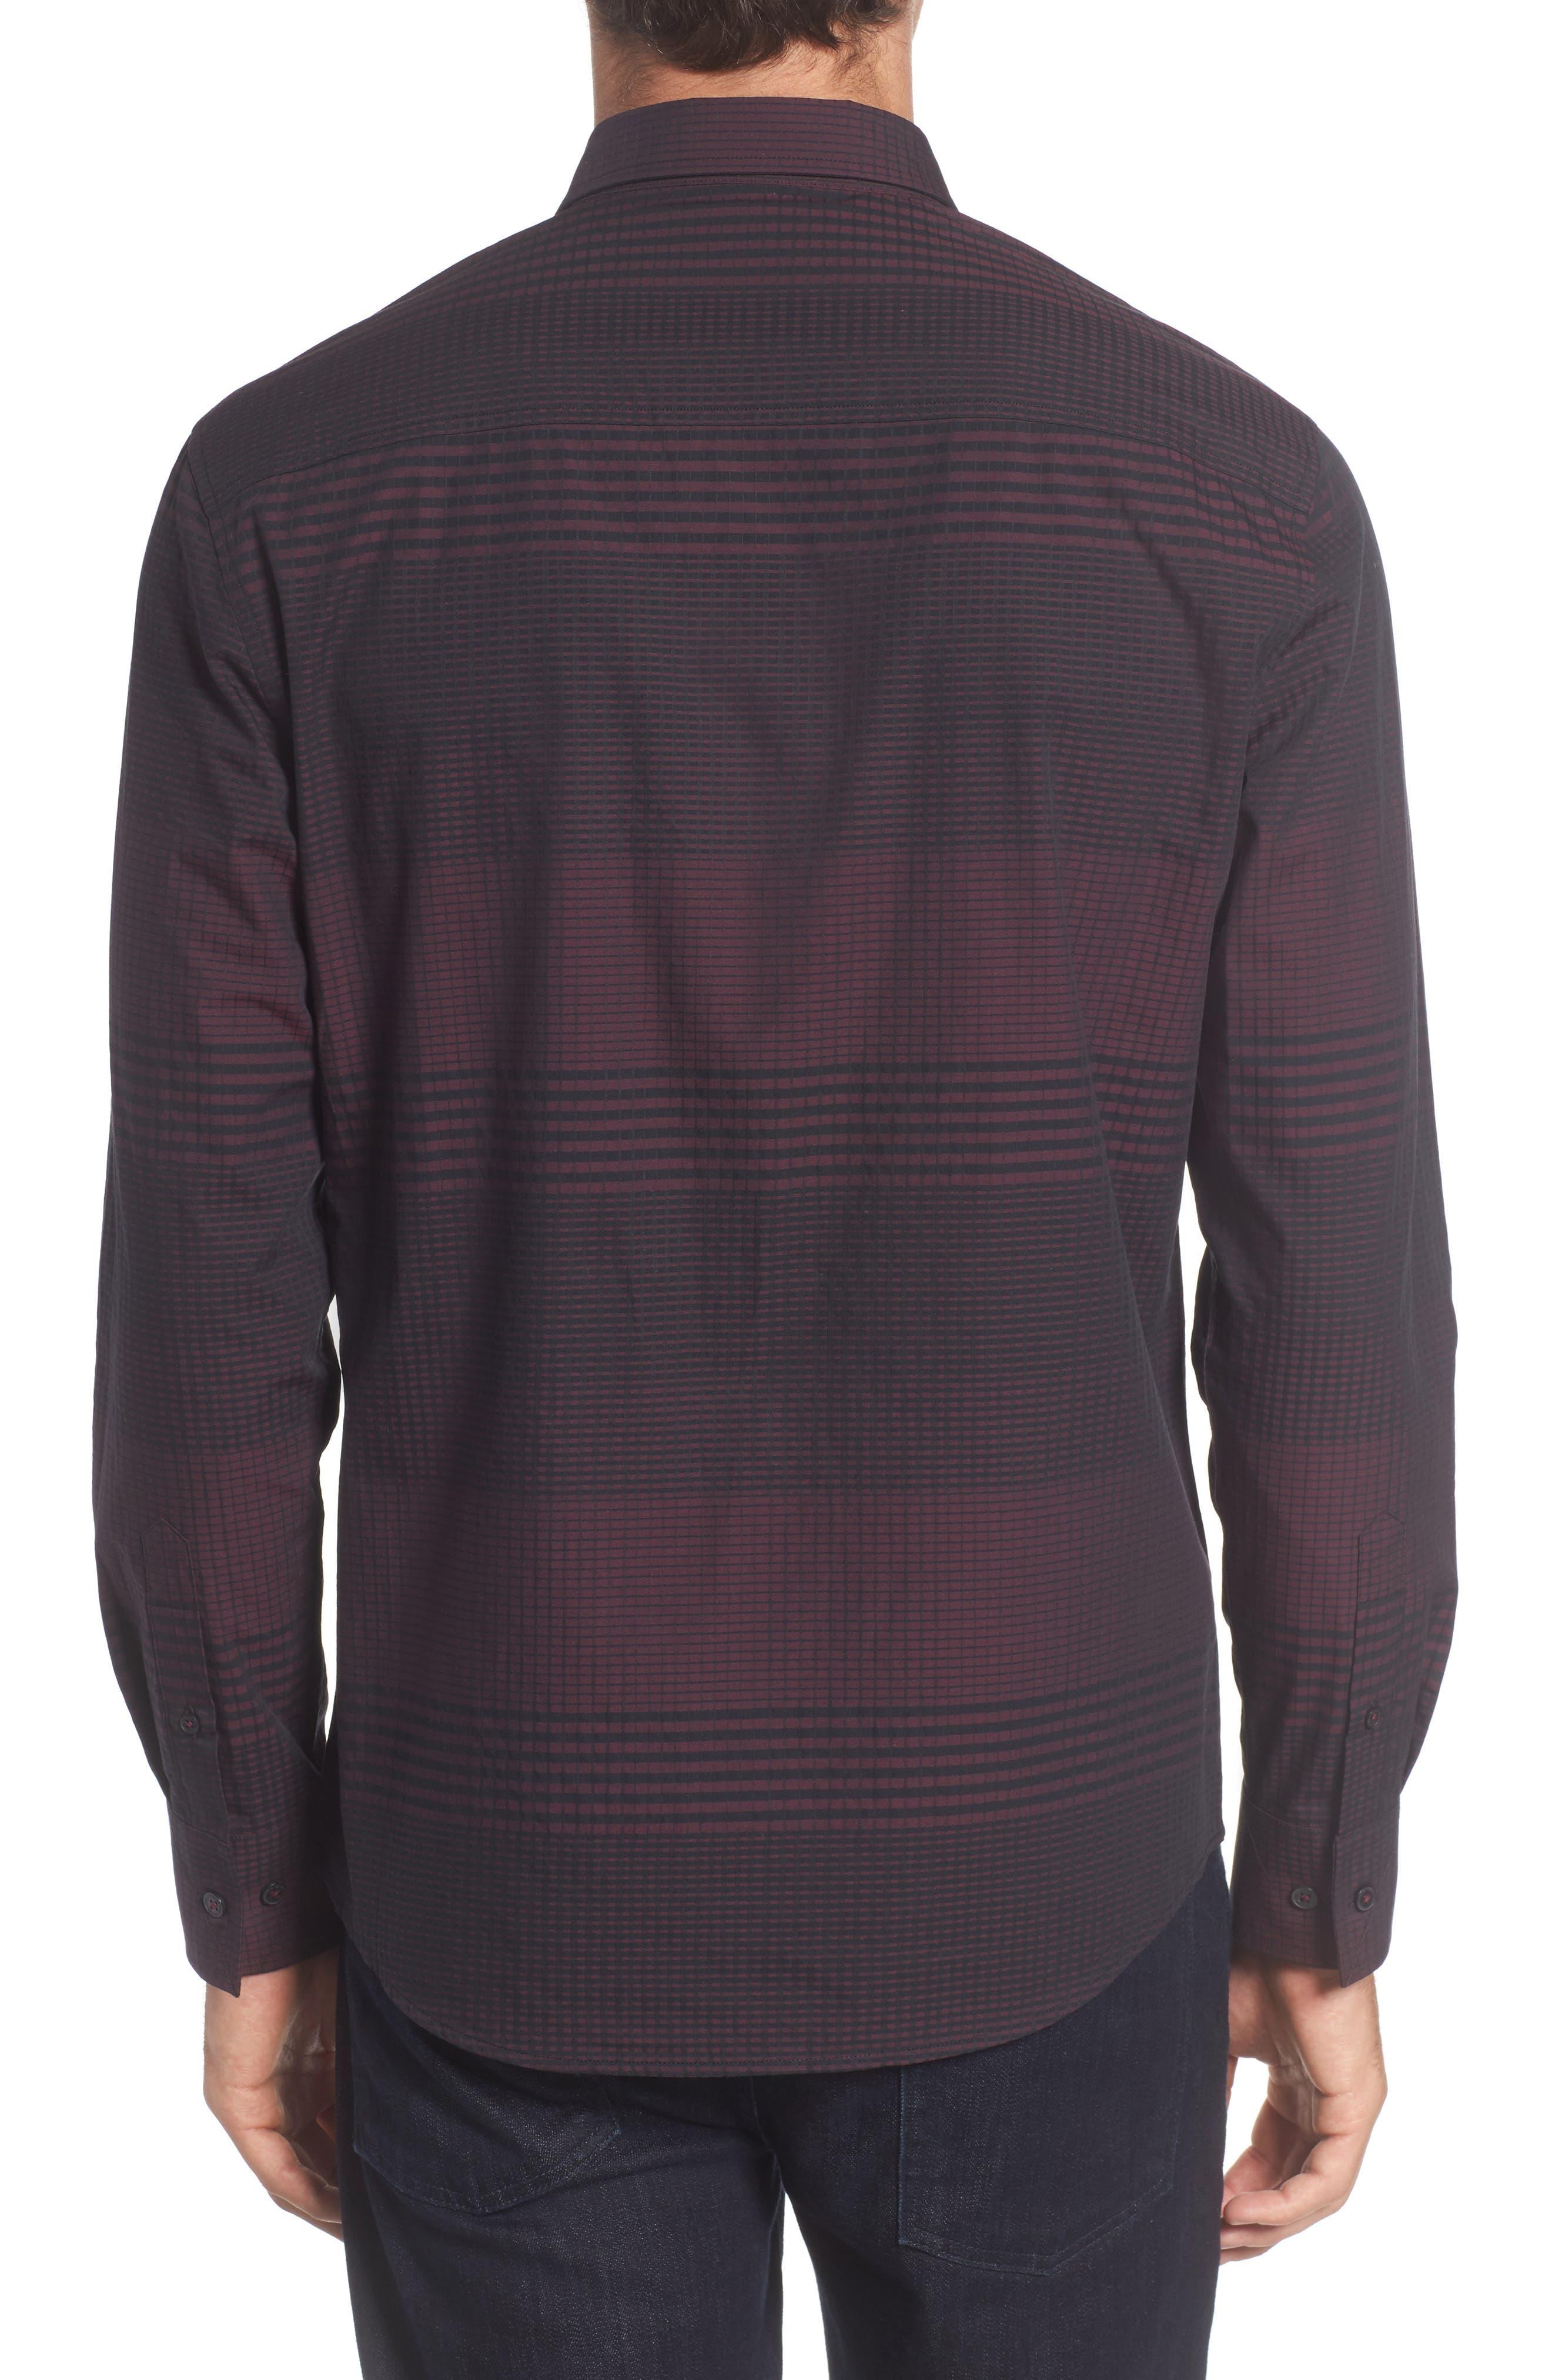 Slim Fit Check Plaid Sport Shirt,                             Alternate thumbnail 2, color,                             BURGUNDY/ BLACK CHECK PLAID